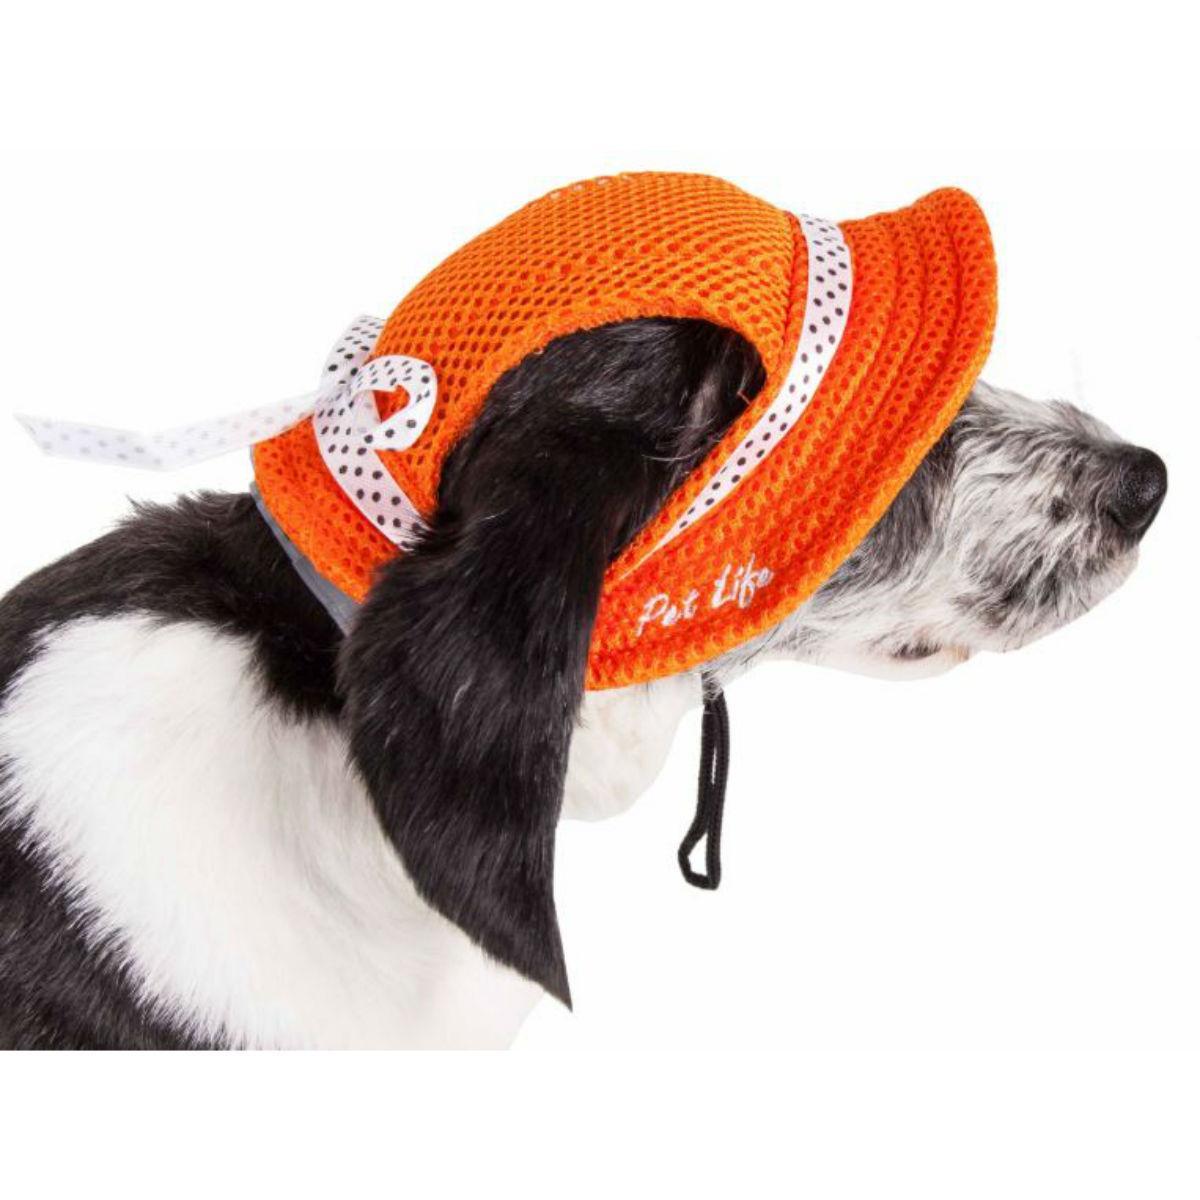 Pet Life 'Sea Spot Sun' UV Protectant Mesh Brimmed Dog Hat Cap - Orange